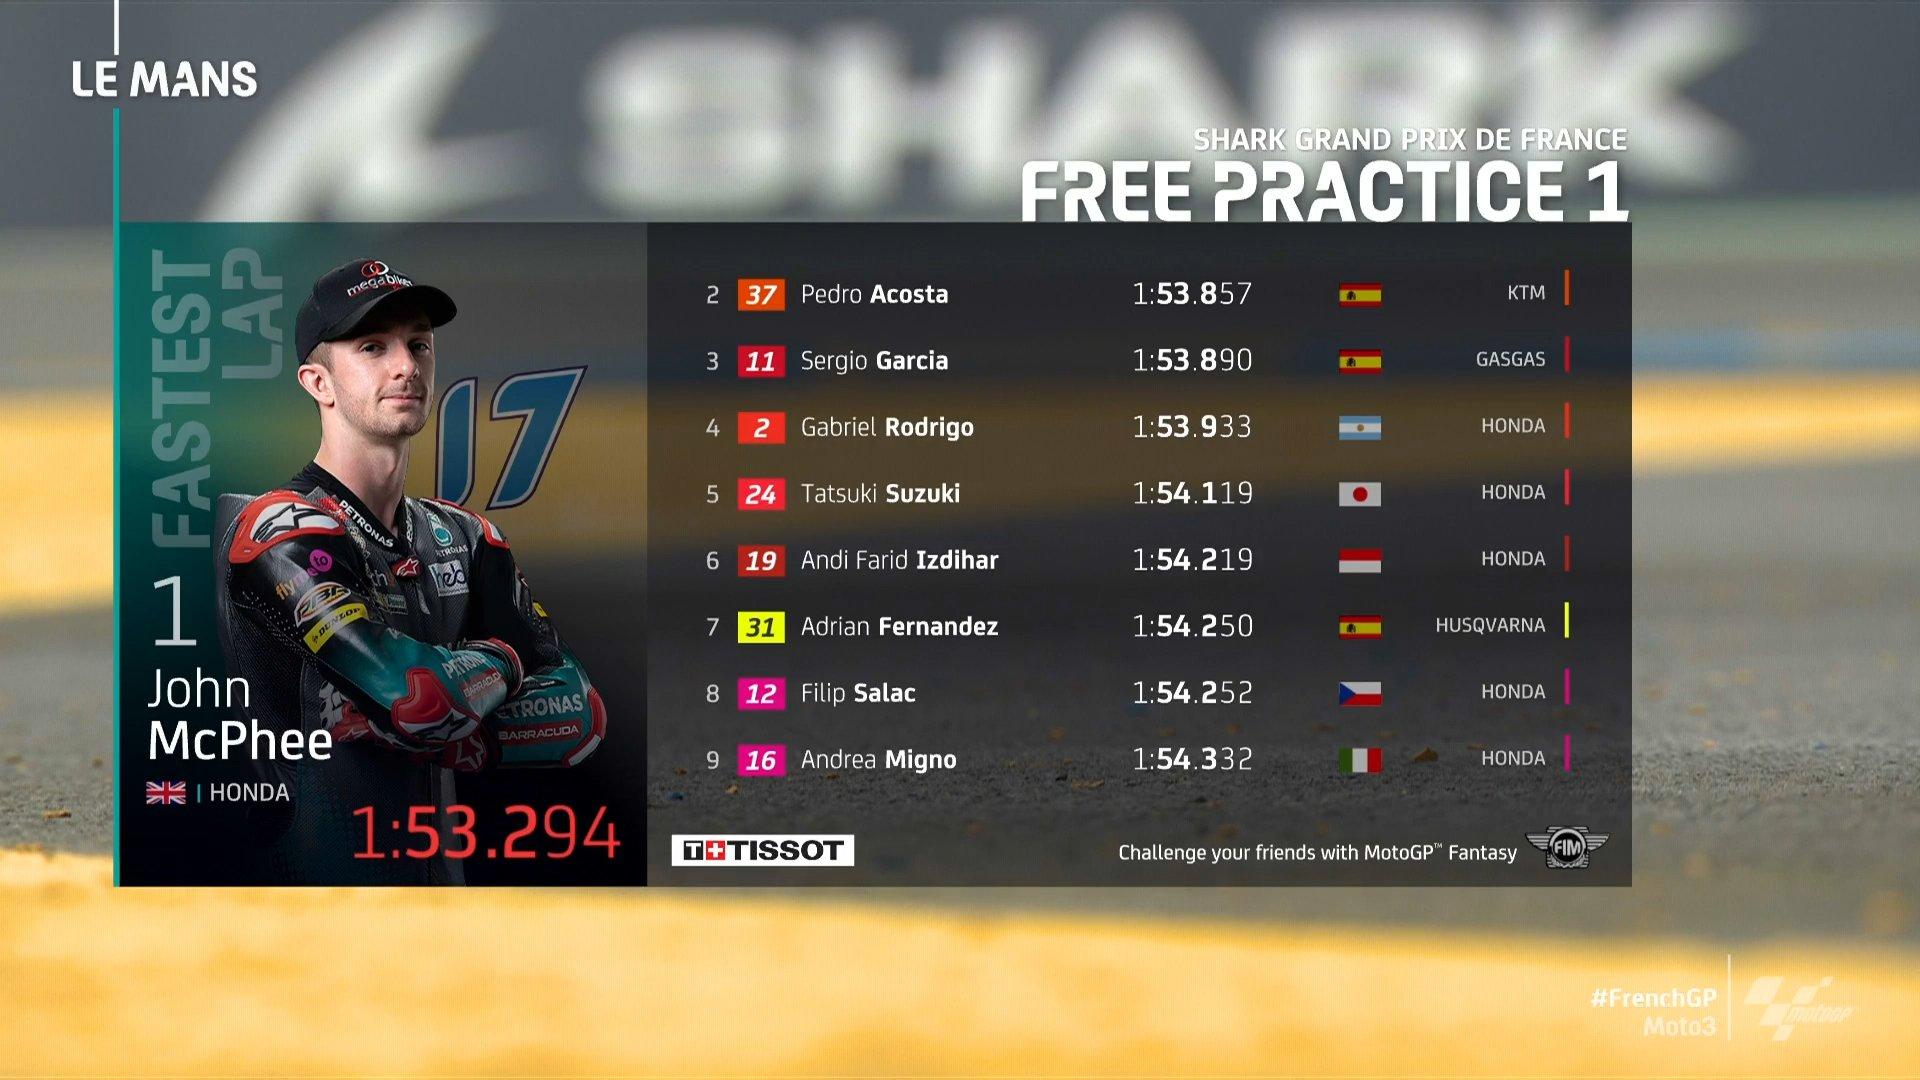 Hasil FP1 Moto3 Perancis